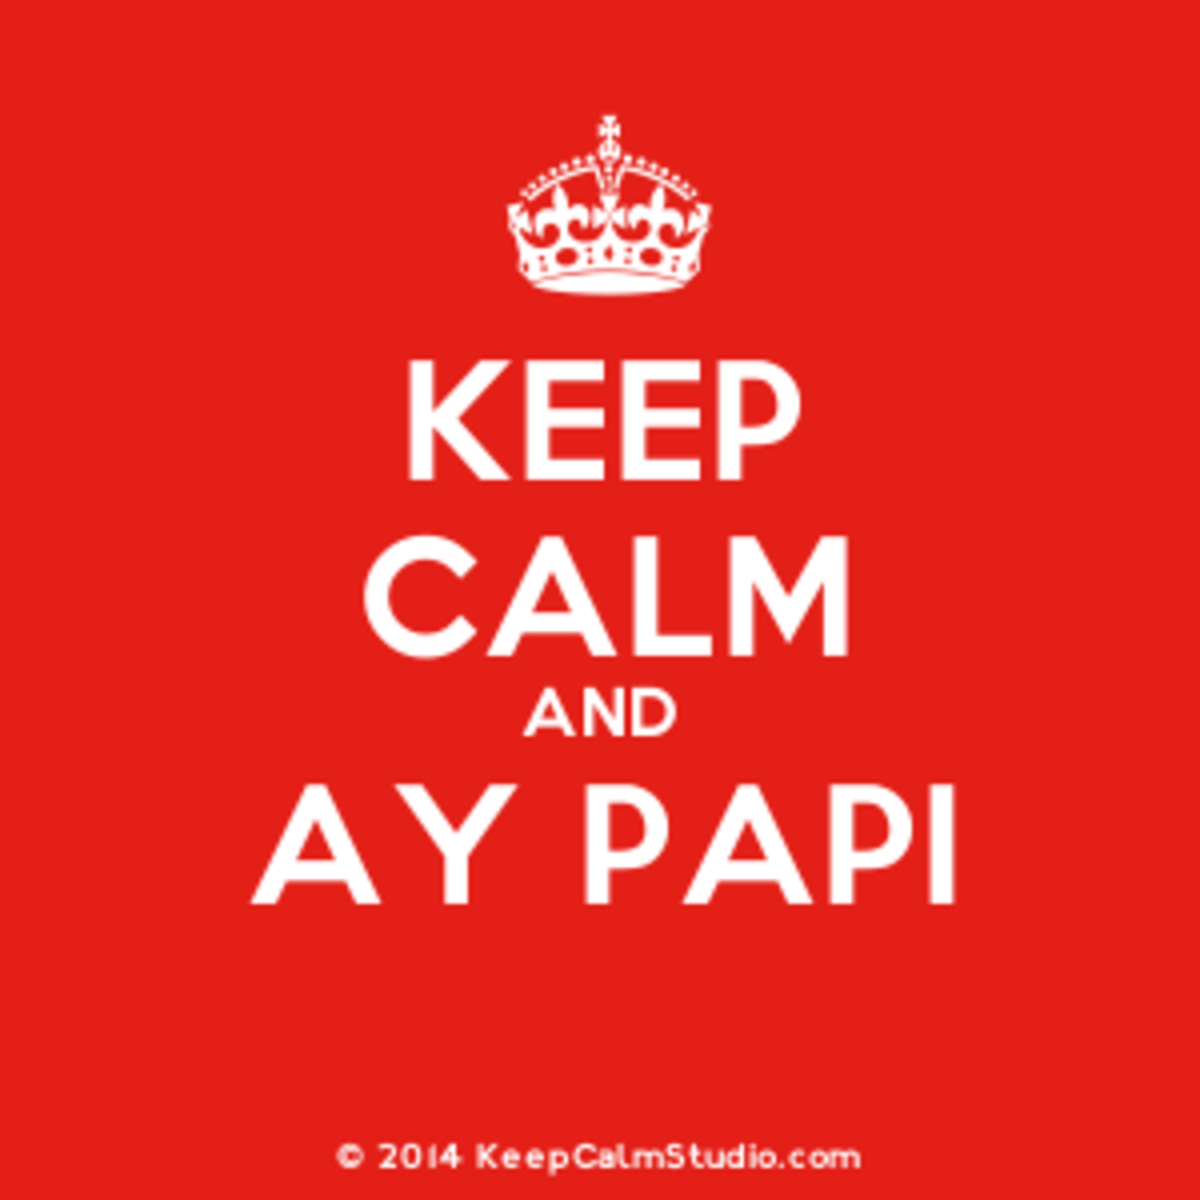 AY PAPI!!!